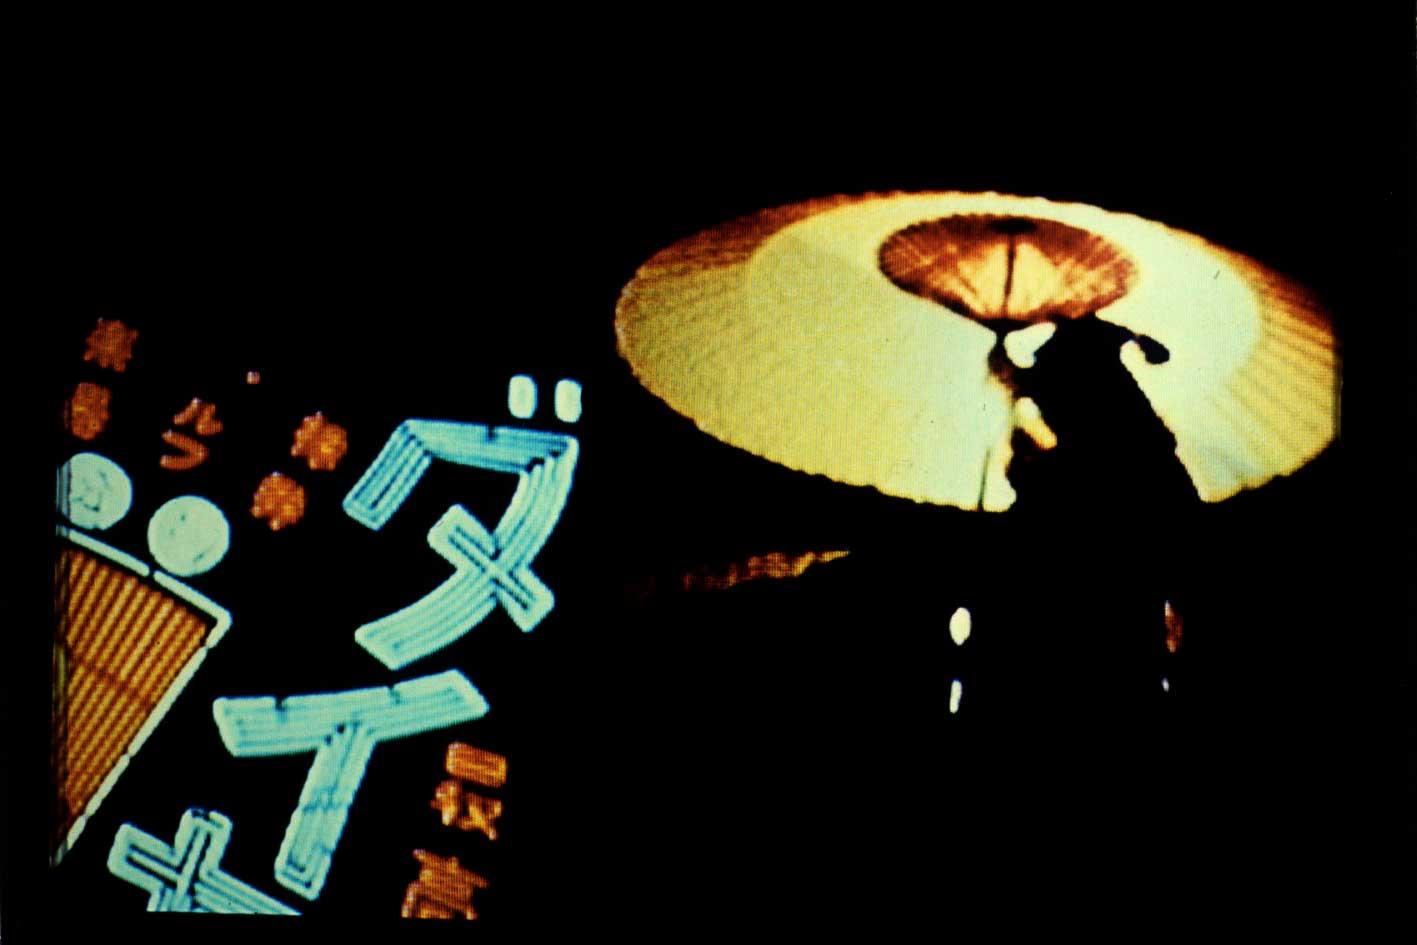 Umbrella-neon